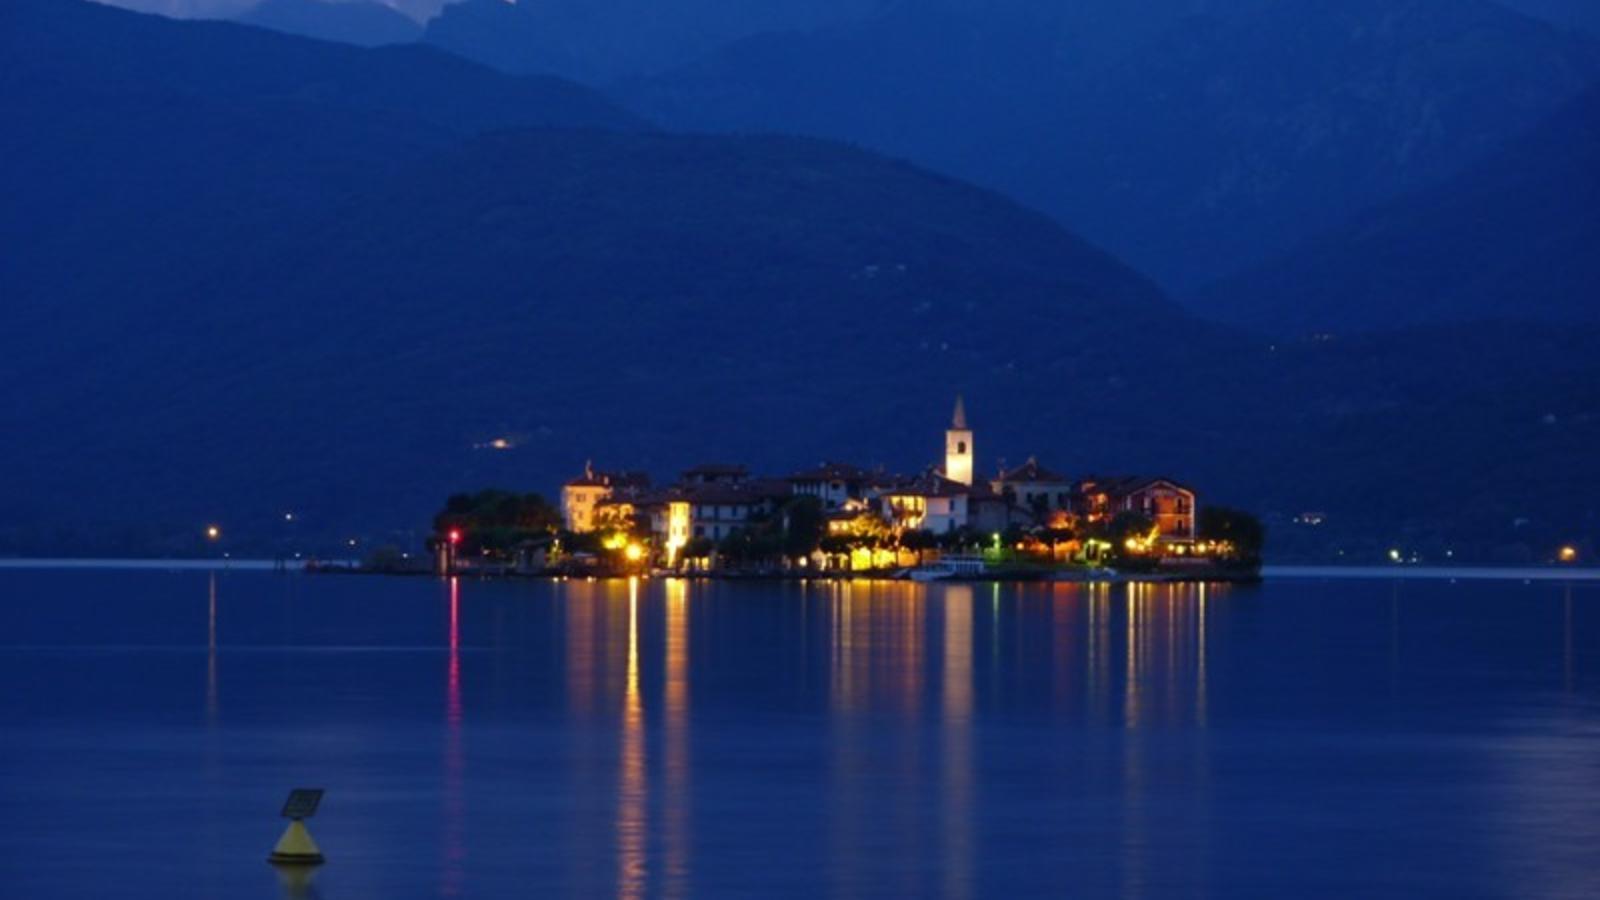 Hotel della torre hotel in stresa lake maggiore for Stresa lake maggiore